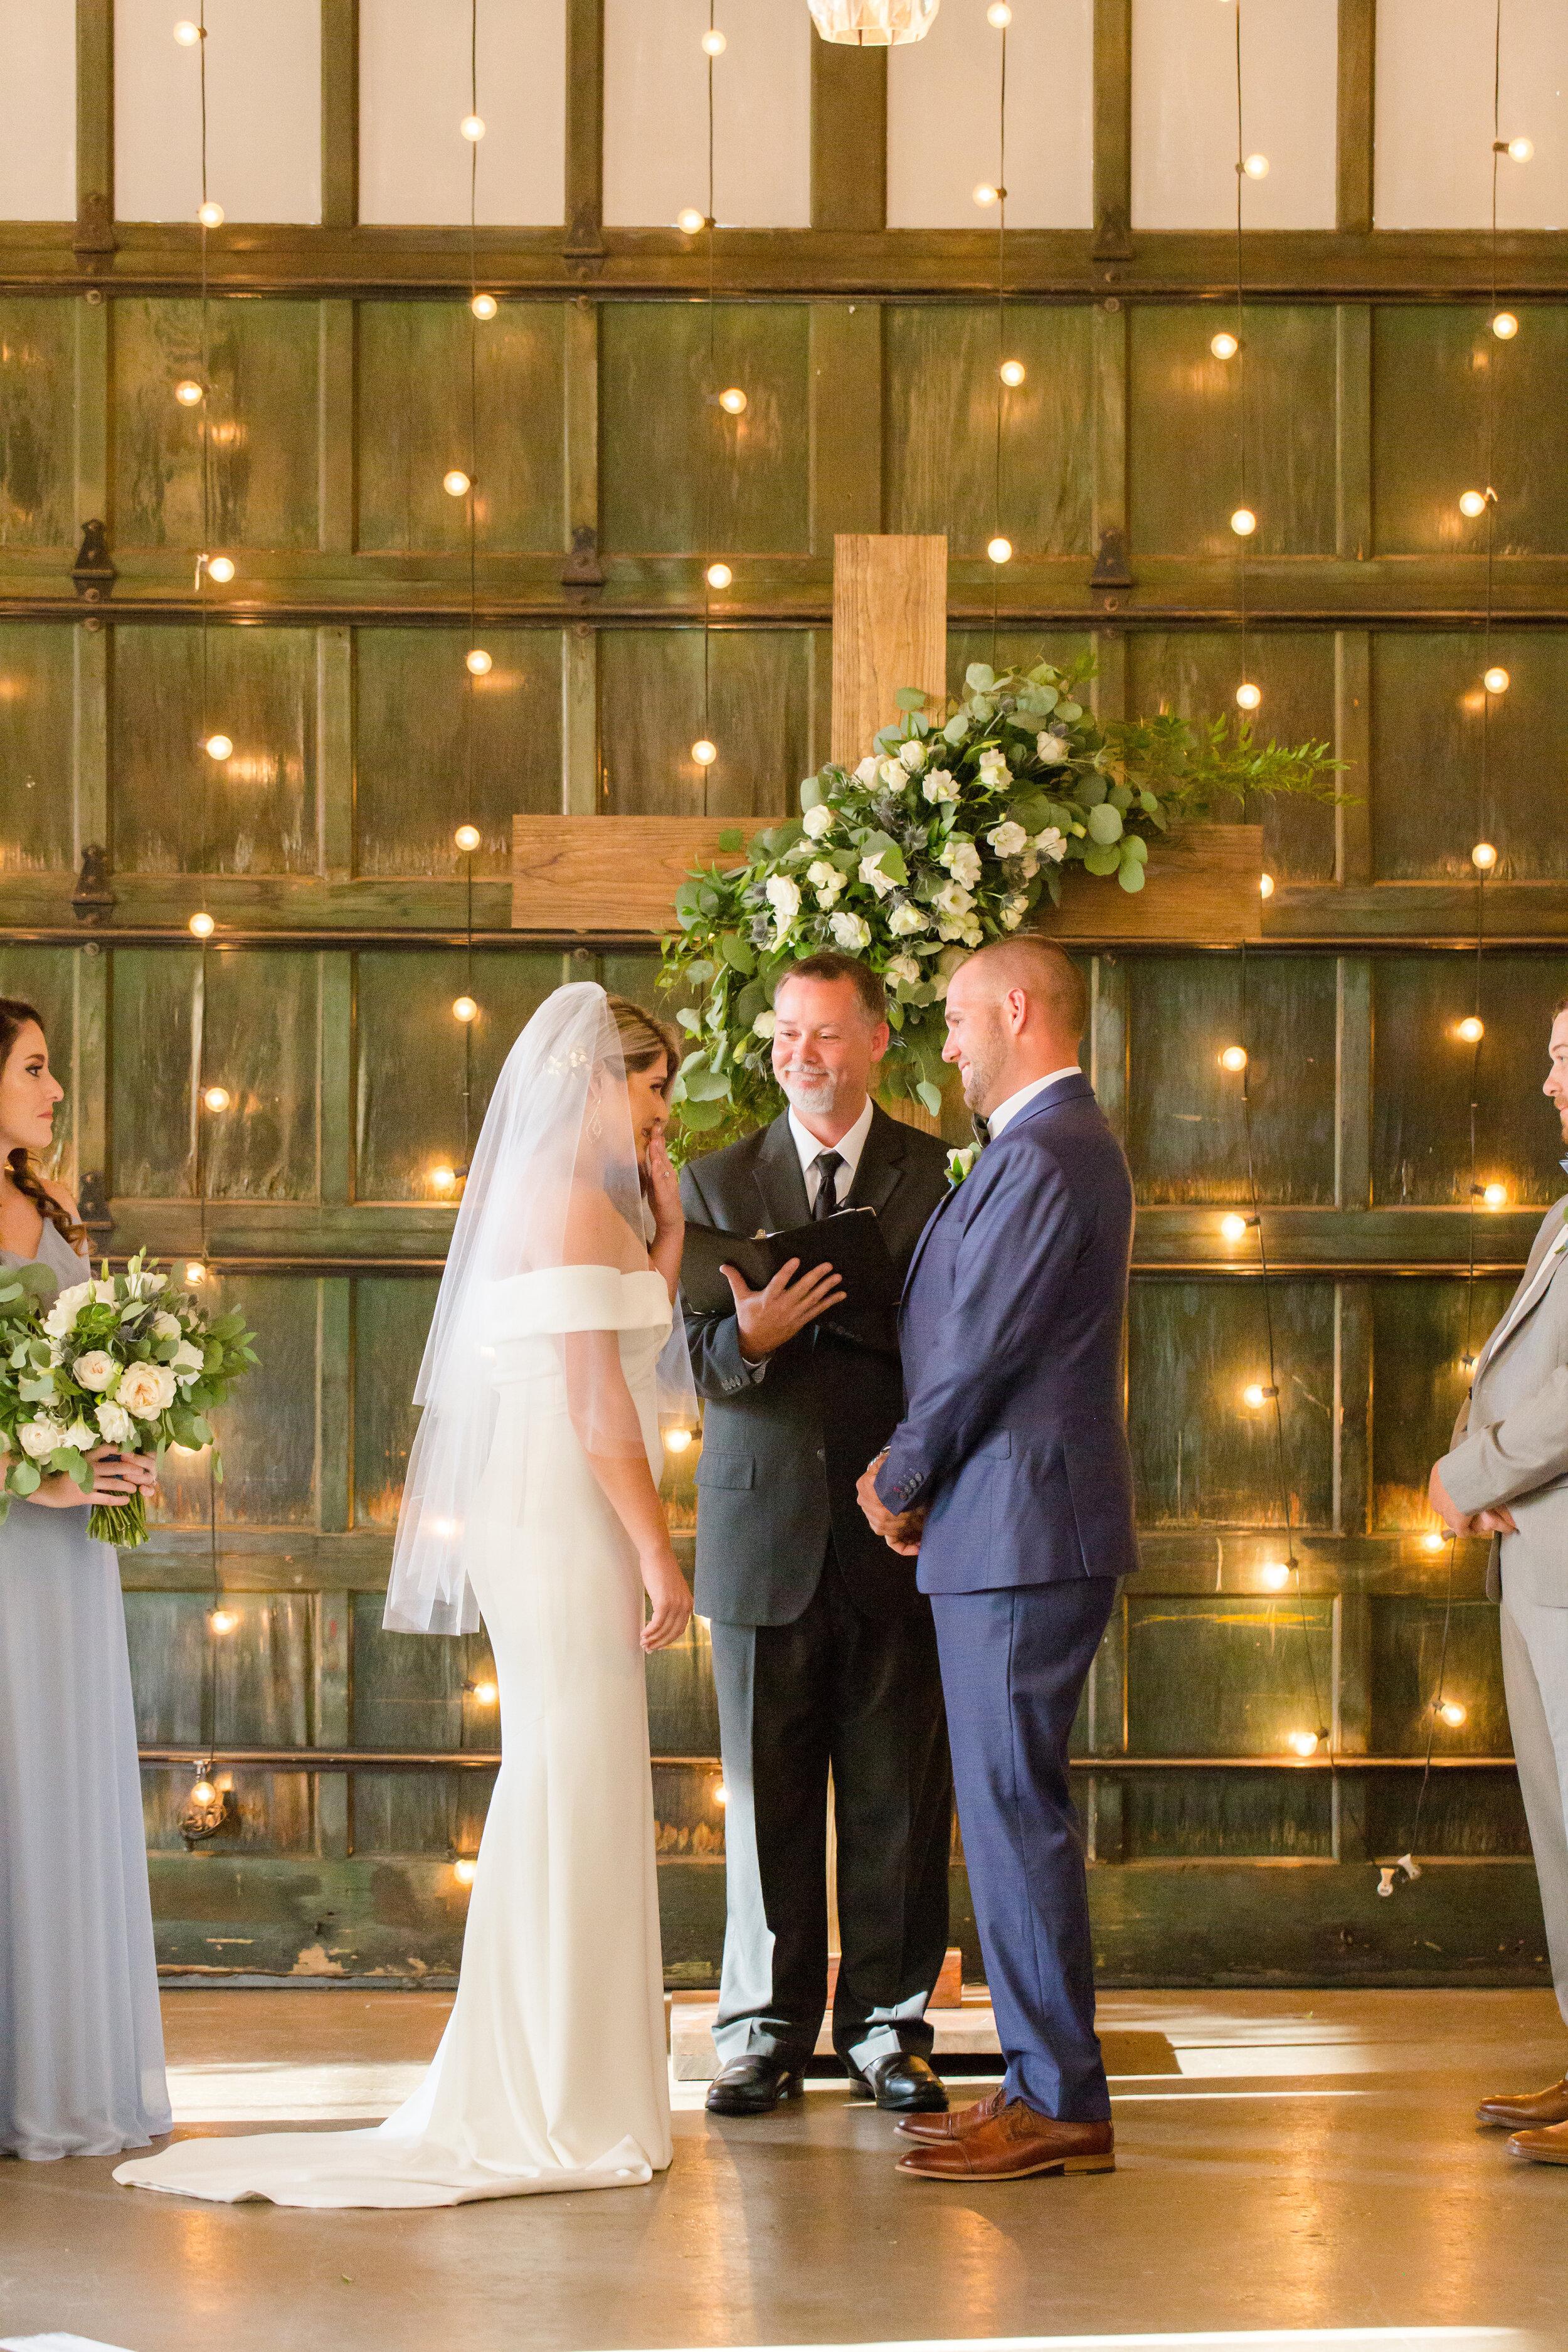 ivory-and-beau-bride-wedding-dresses-bridal-boutique-bridal-shop-savannah-wedding-shop-DGP_SohoSouthCafe_Swanagin-Mullis-319.JPG